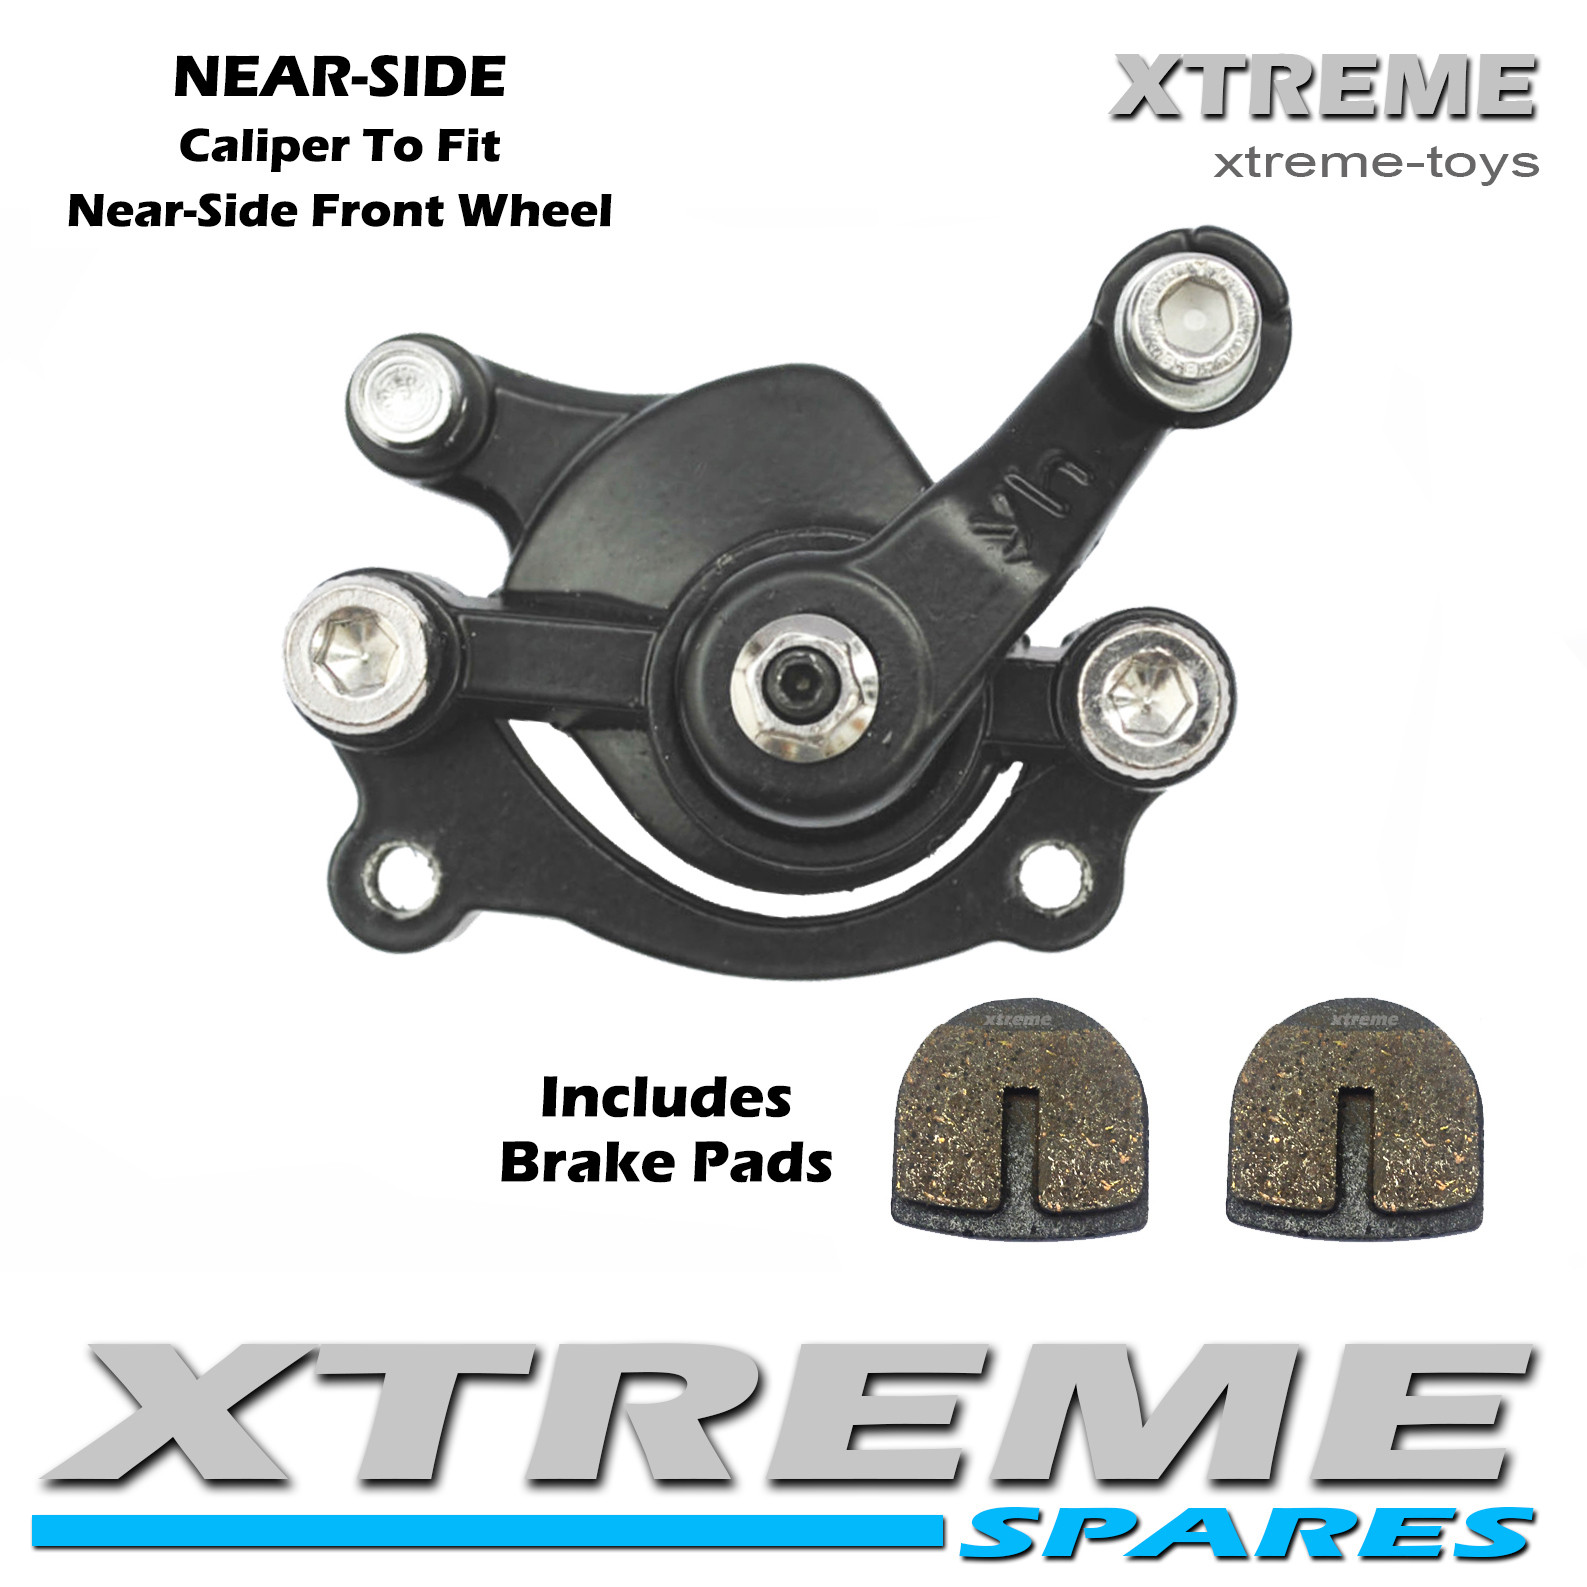 XTM MONSTER QUAD FRONT NEAR-SIDE BRAKE CALIPER WITH BRAKE PADS